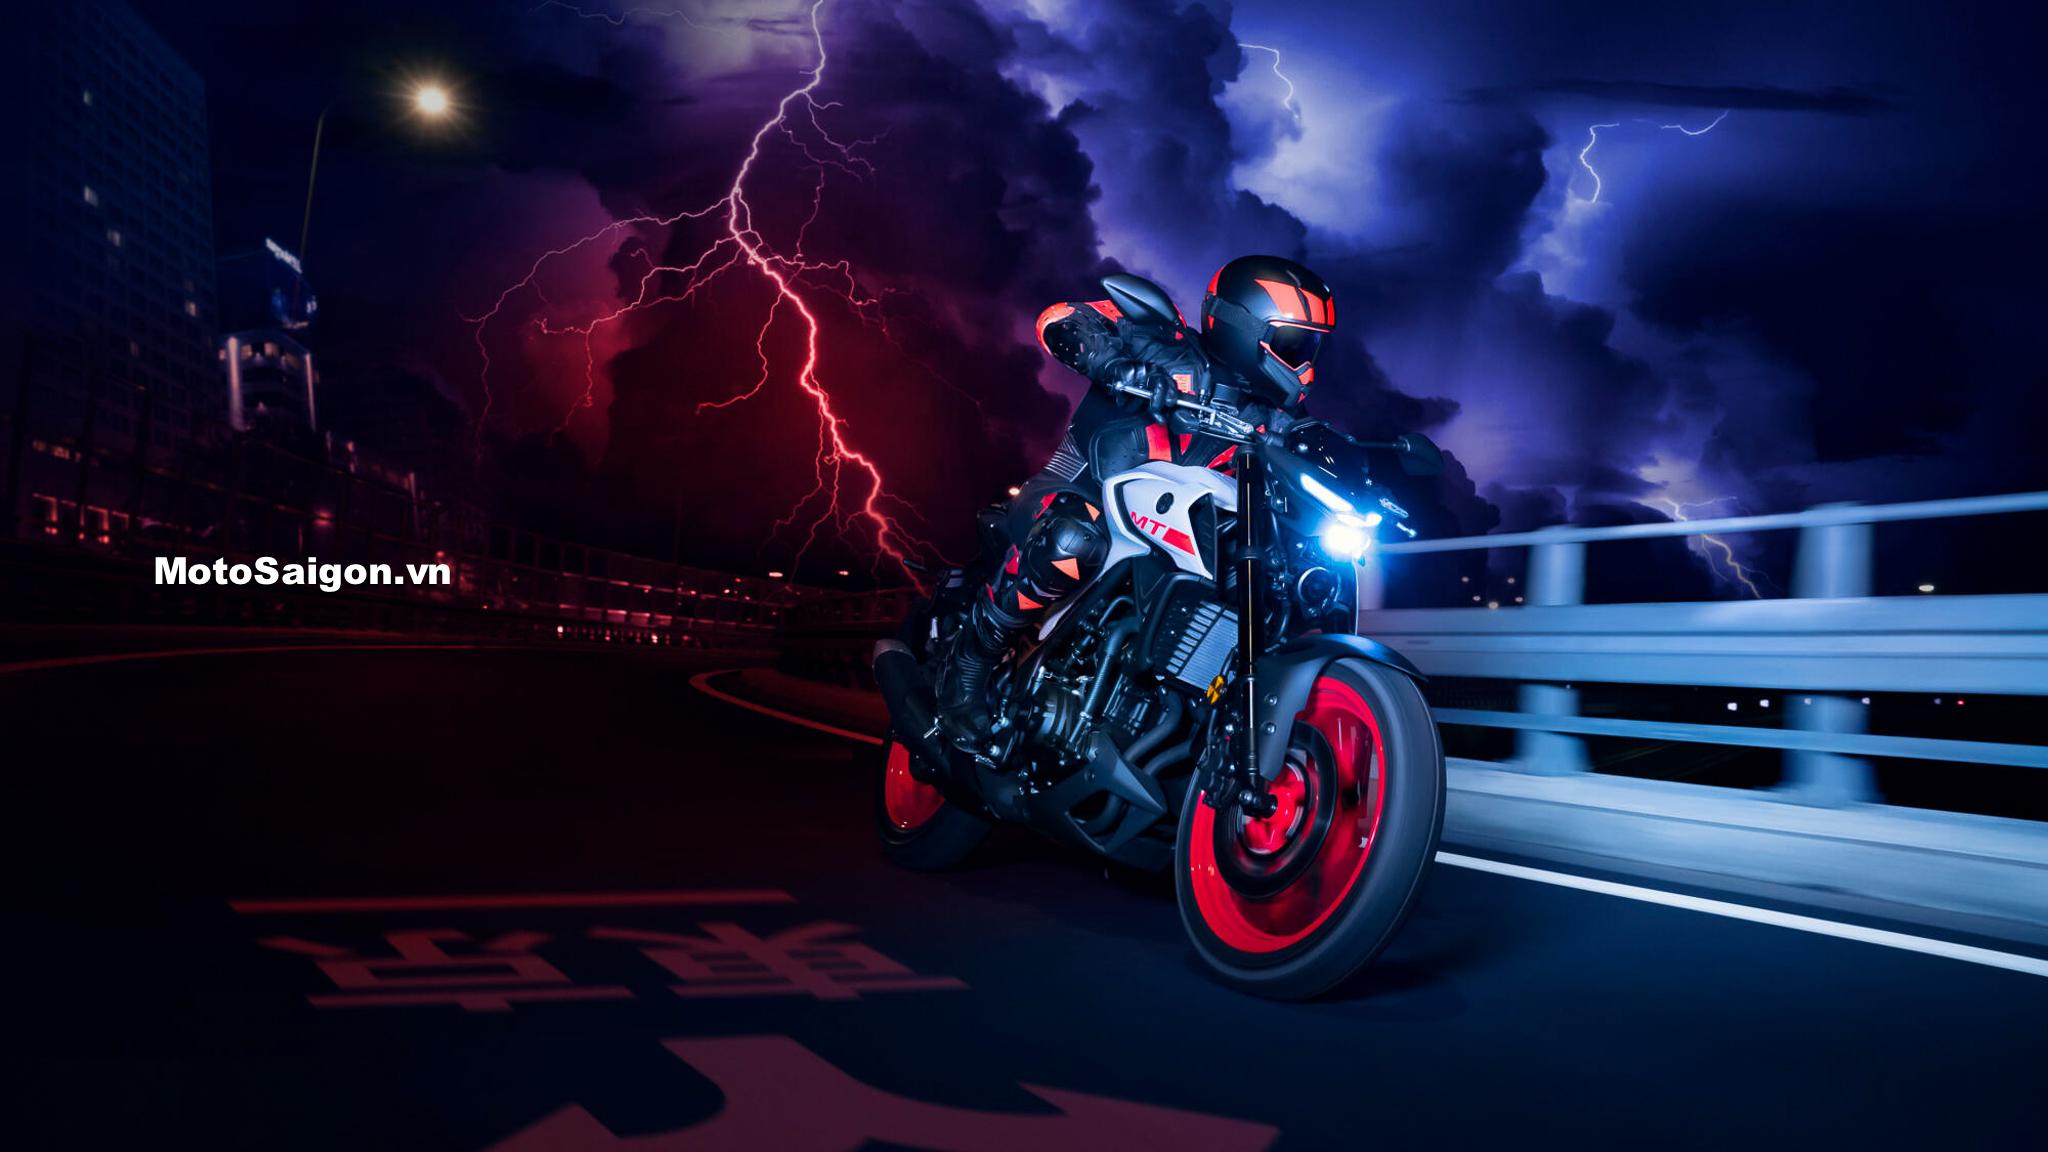 yamaha mt 03 abs 2020 danh gia xe motosaigon 7